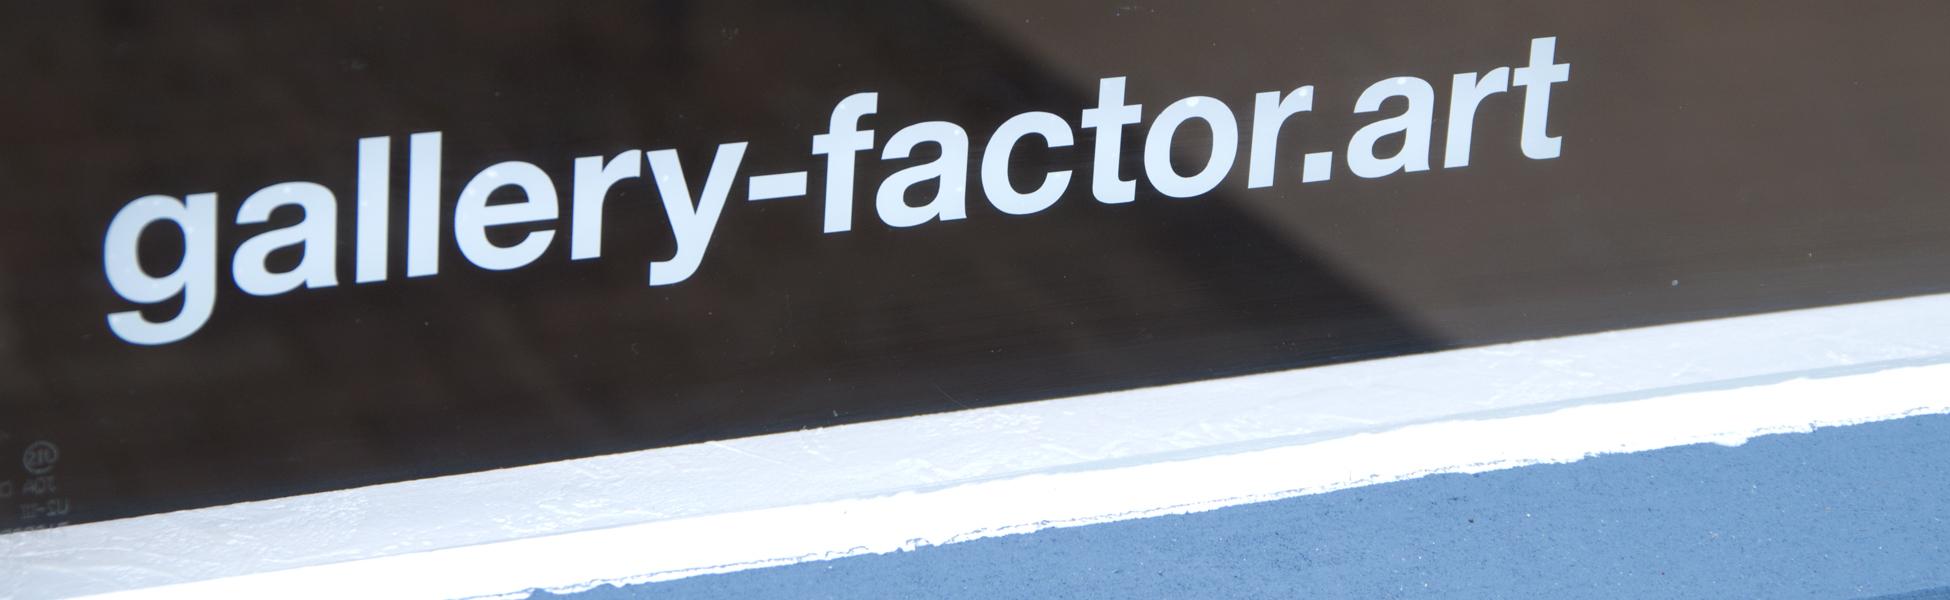 GALLERY FACTOR